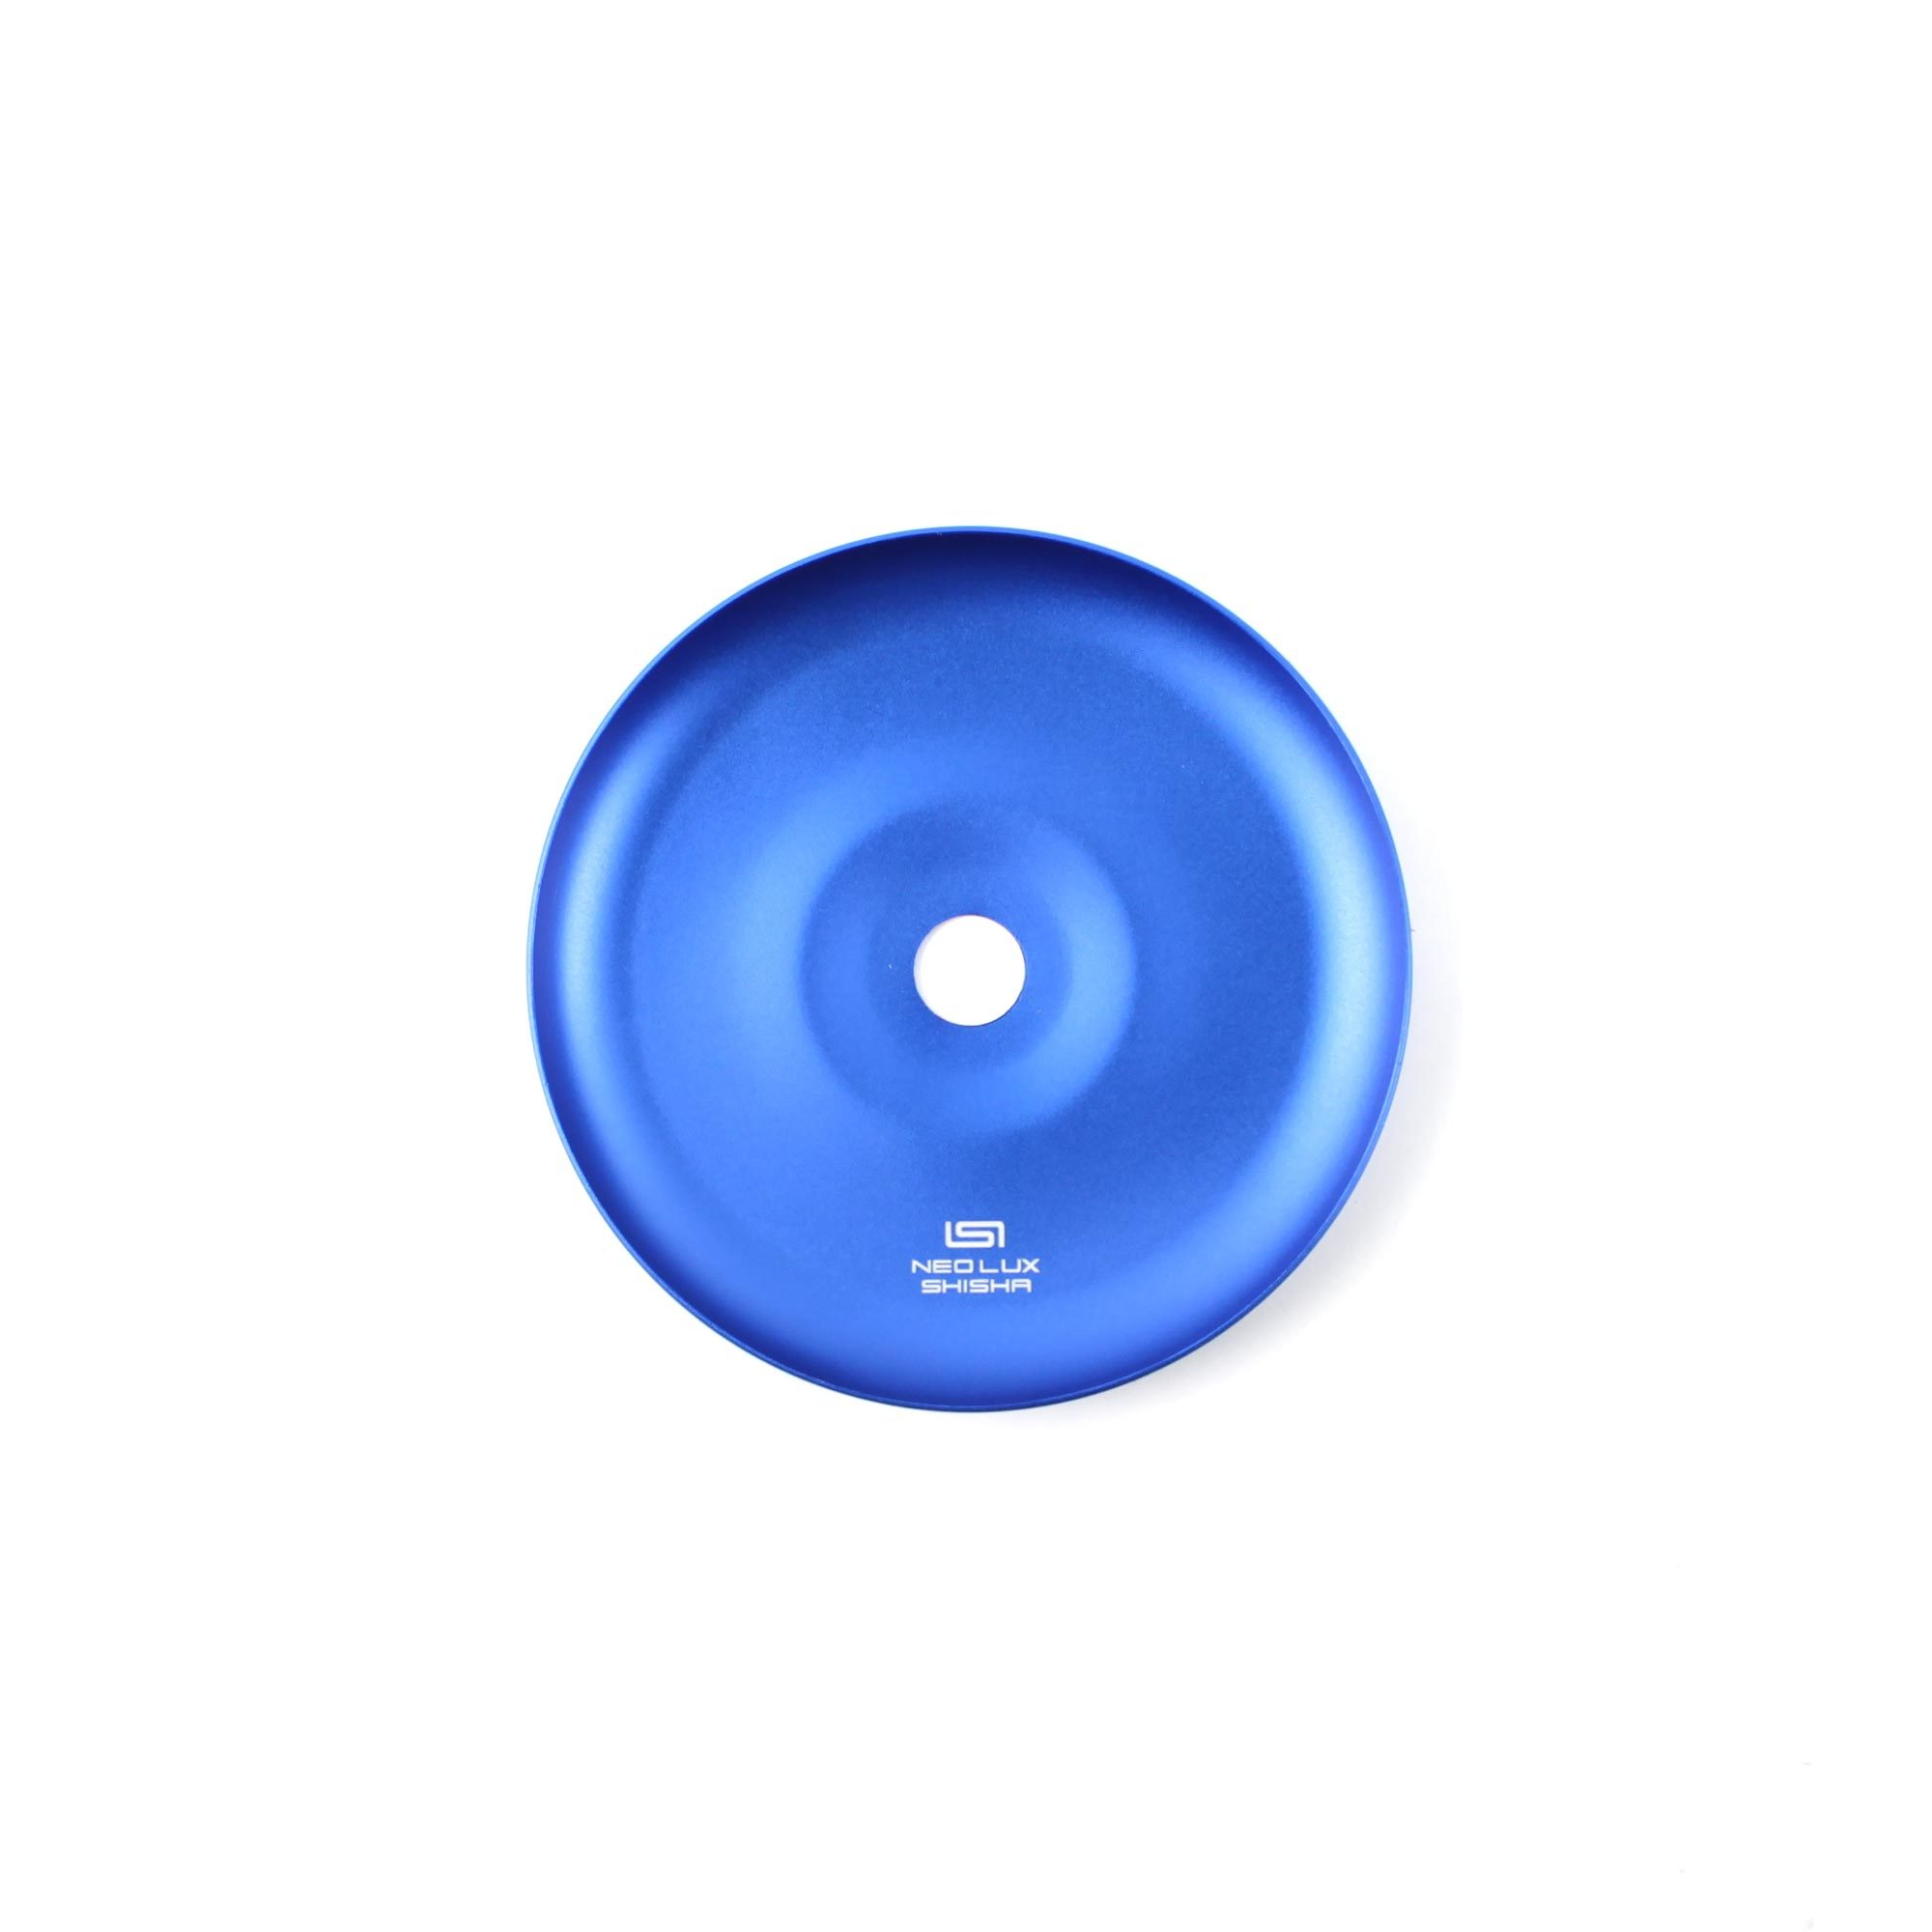 Блюдце для кальяна Neo Lux 1 Blue